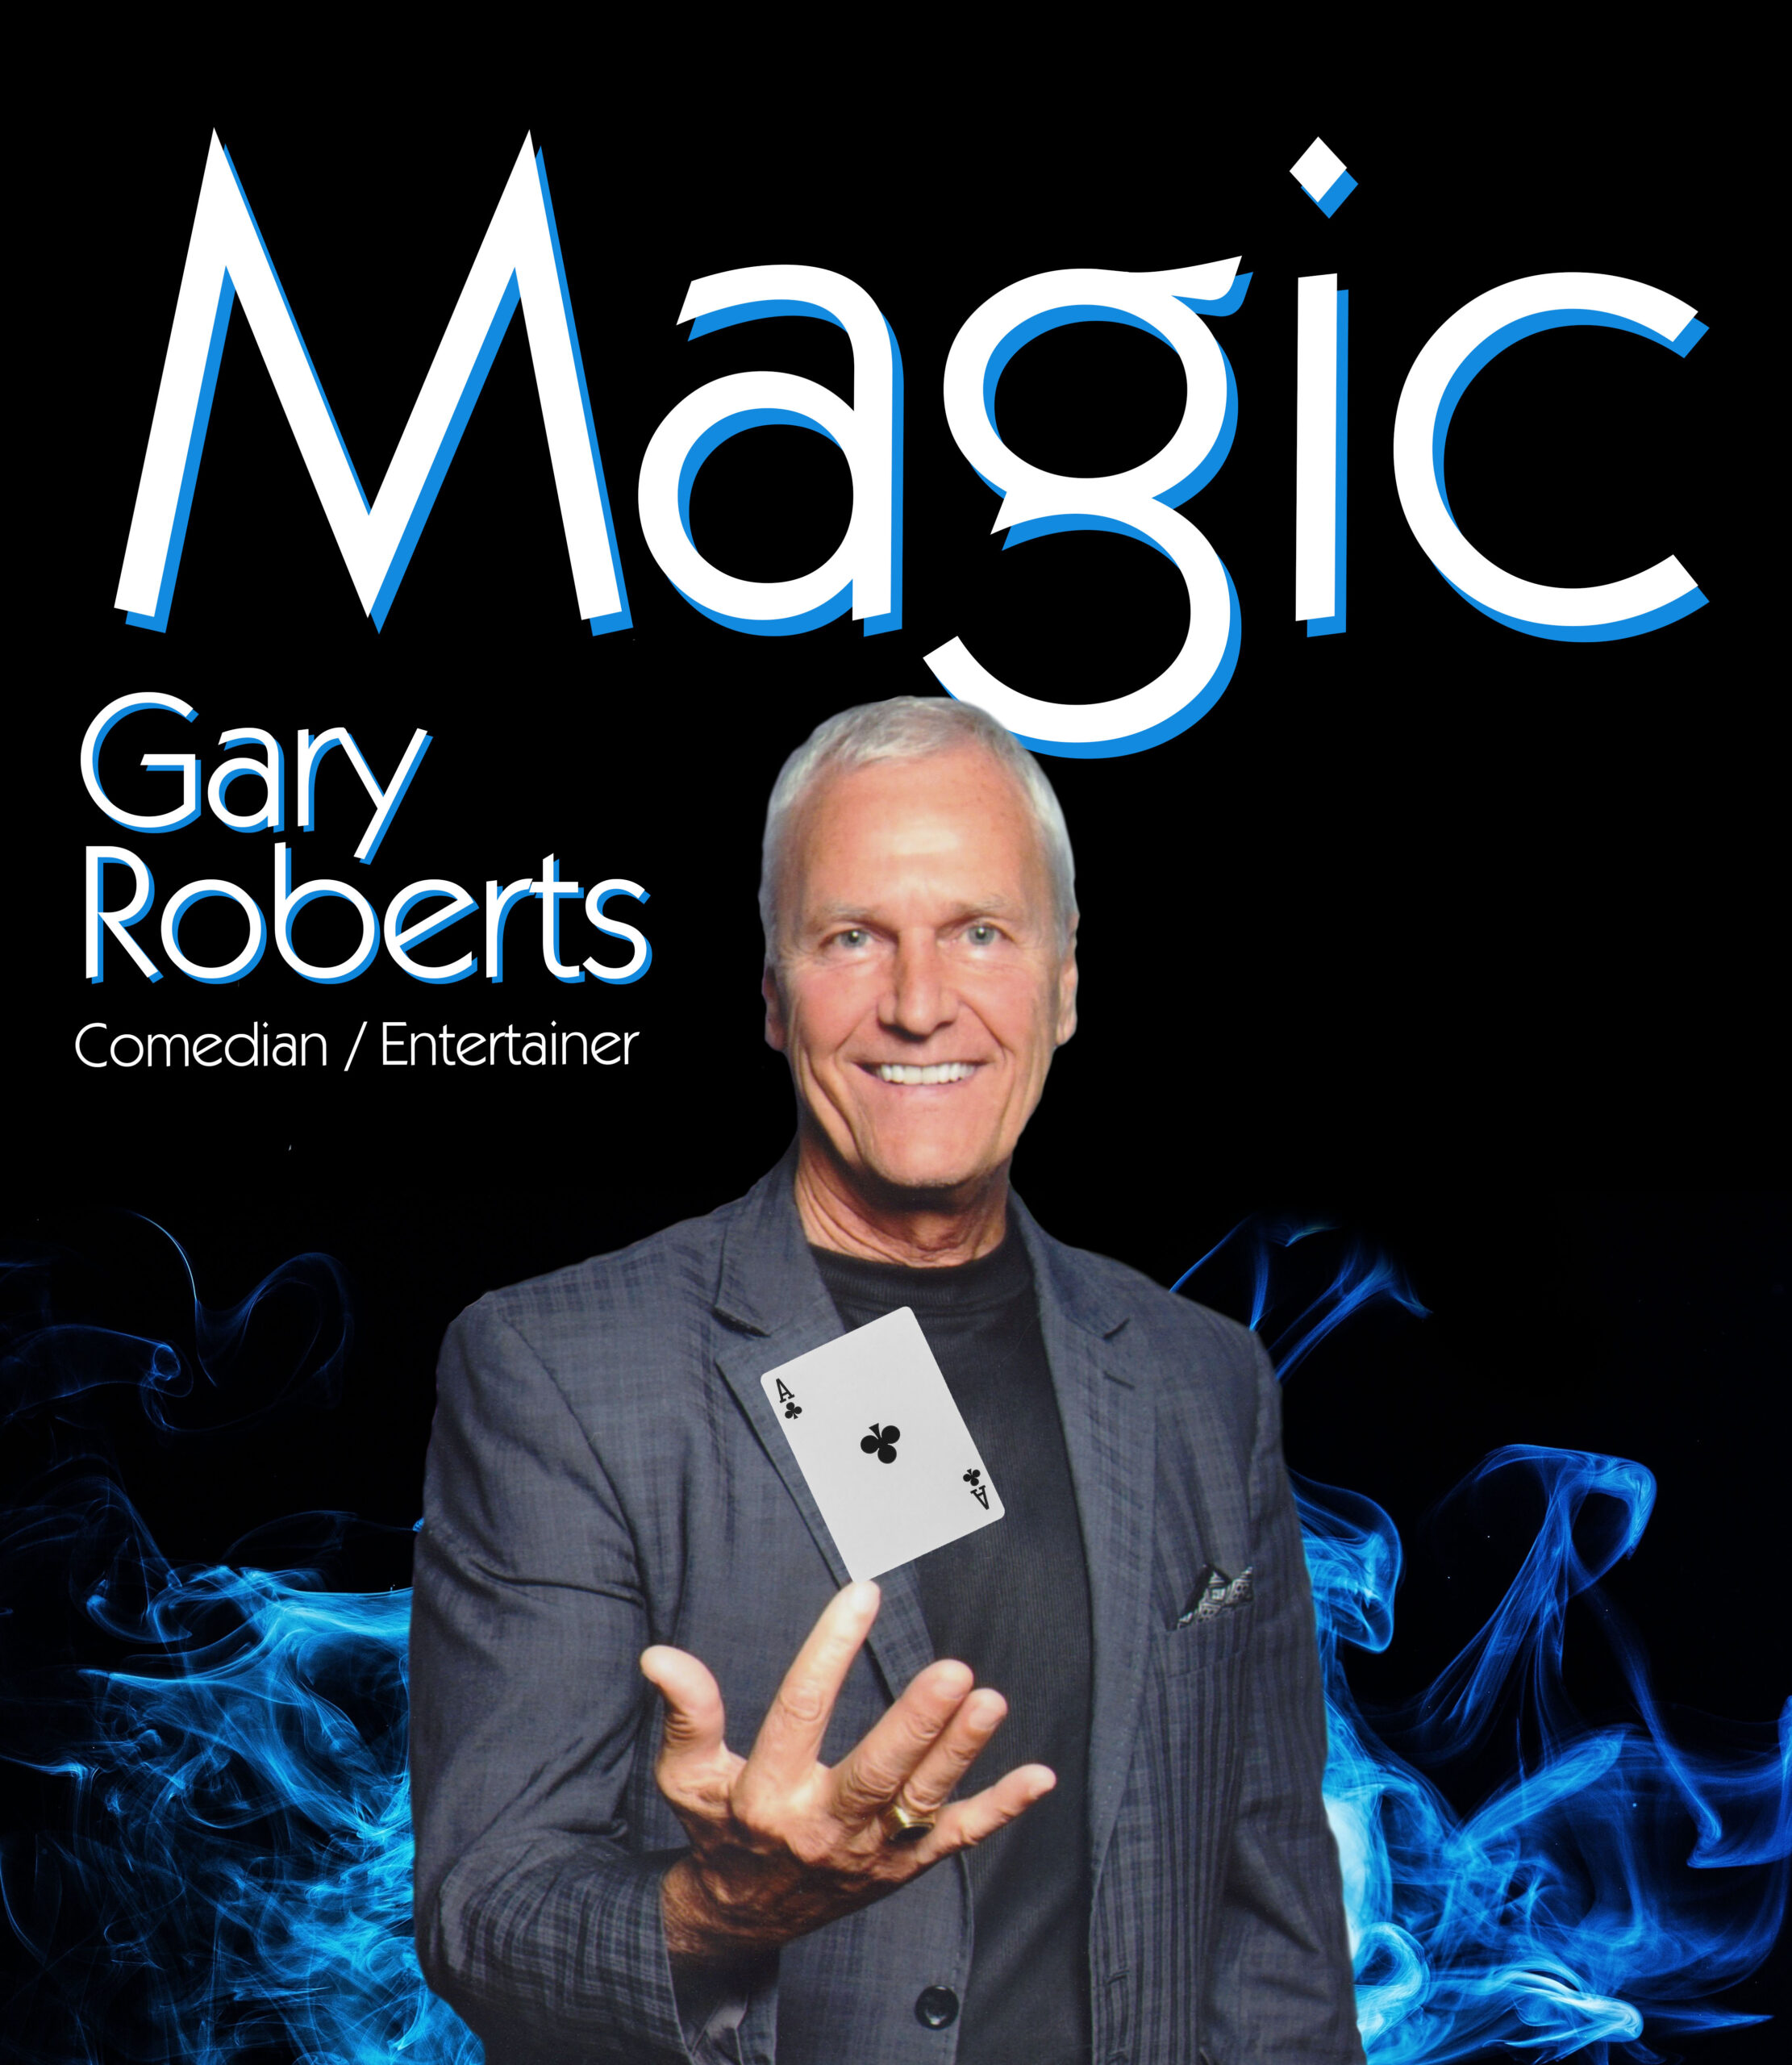 Florida magician comedian corporate entertainer Gary Roberts